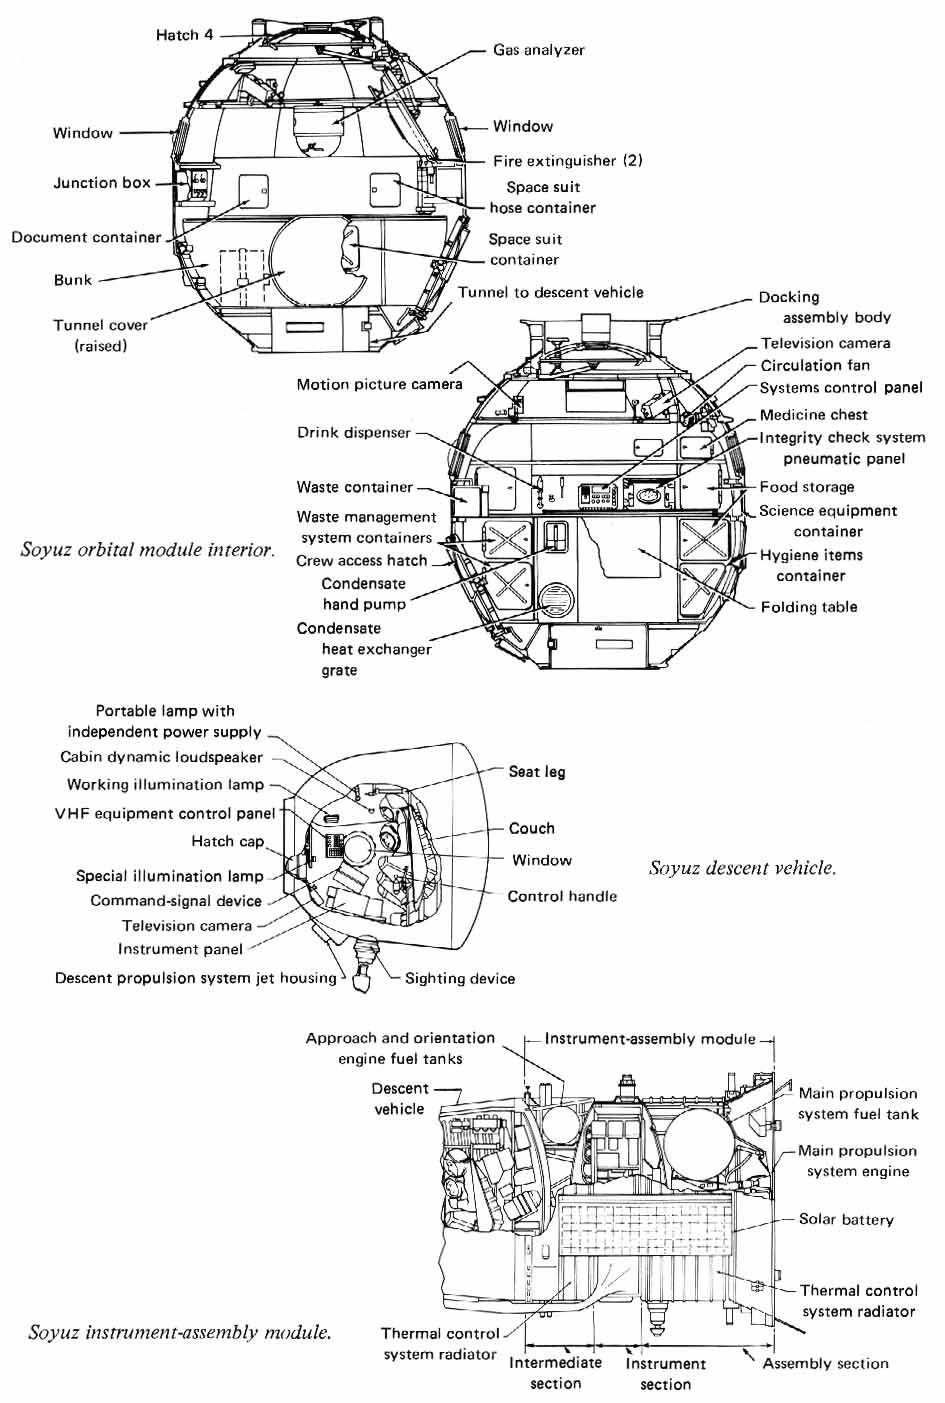 medium resolution of diagram of a 7k engine captain source of wiring diagram u2022 az toyota engine diagram of a 7k engine